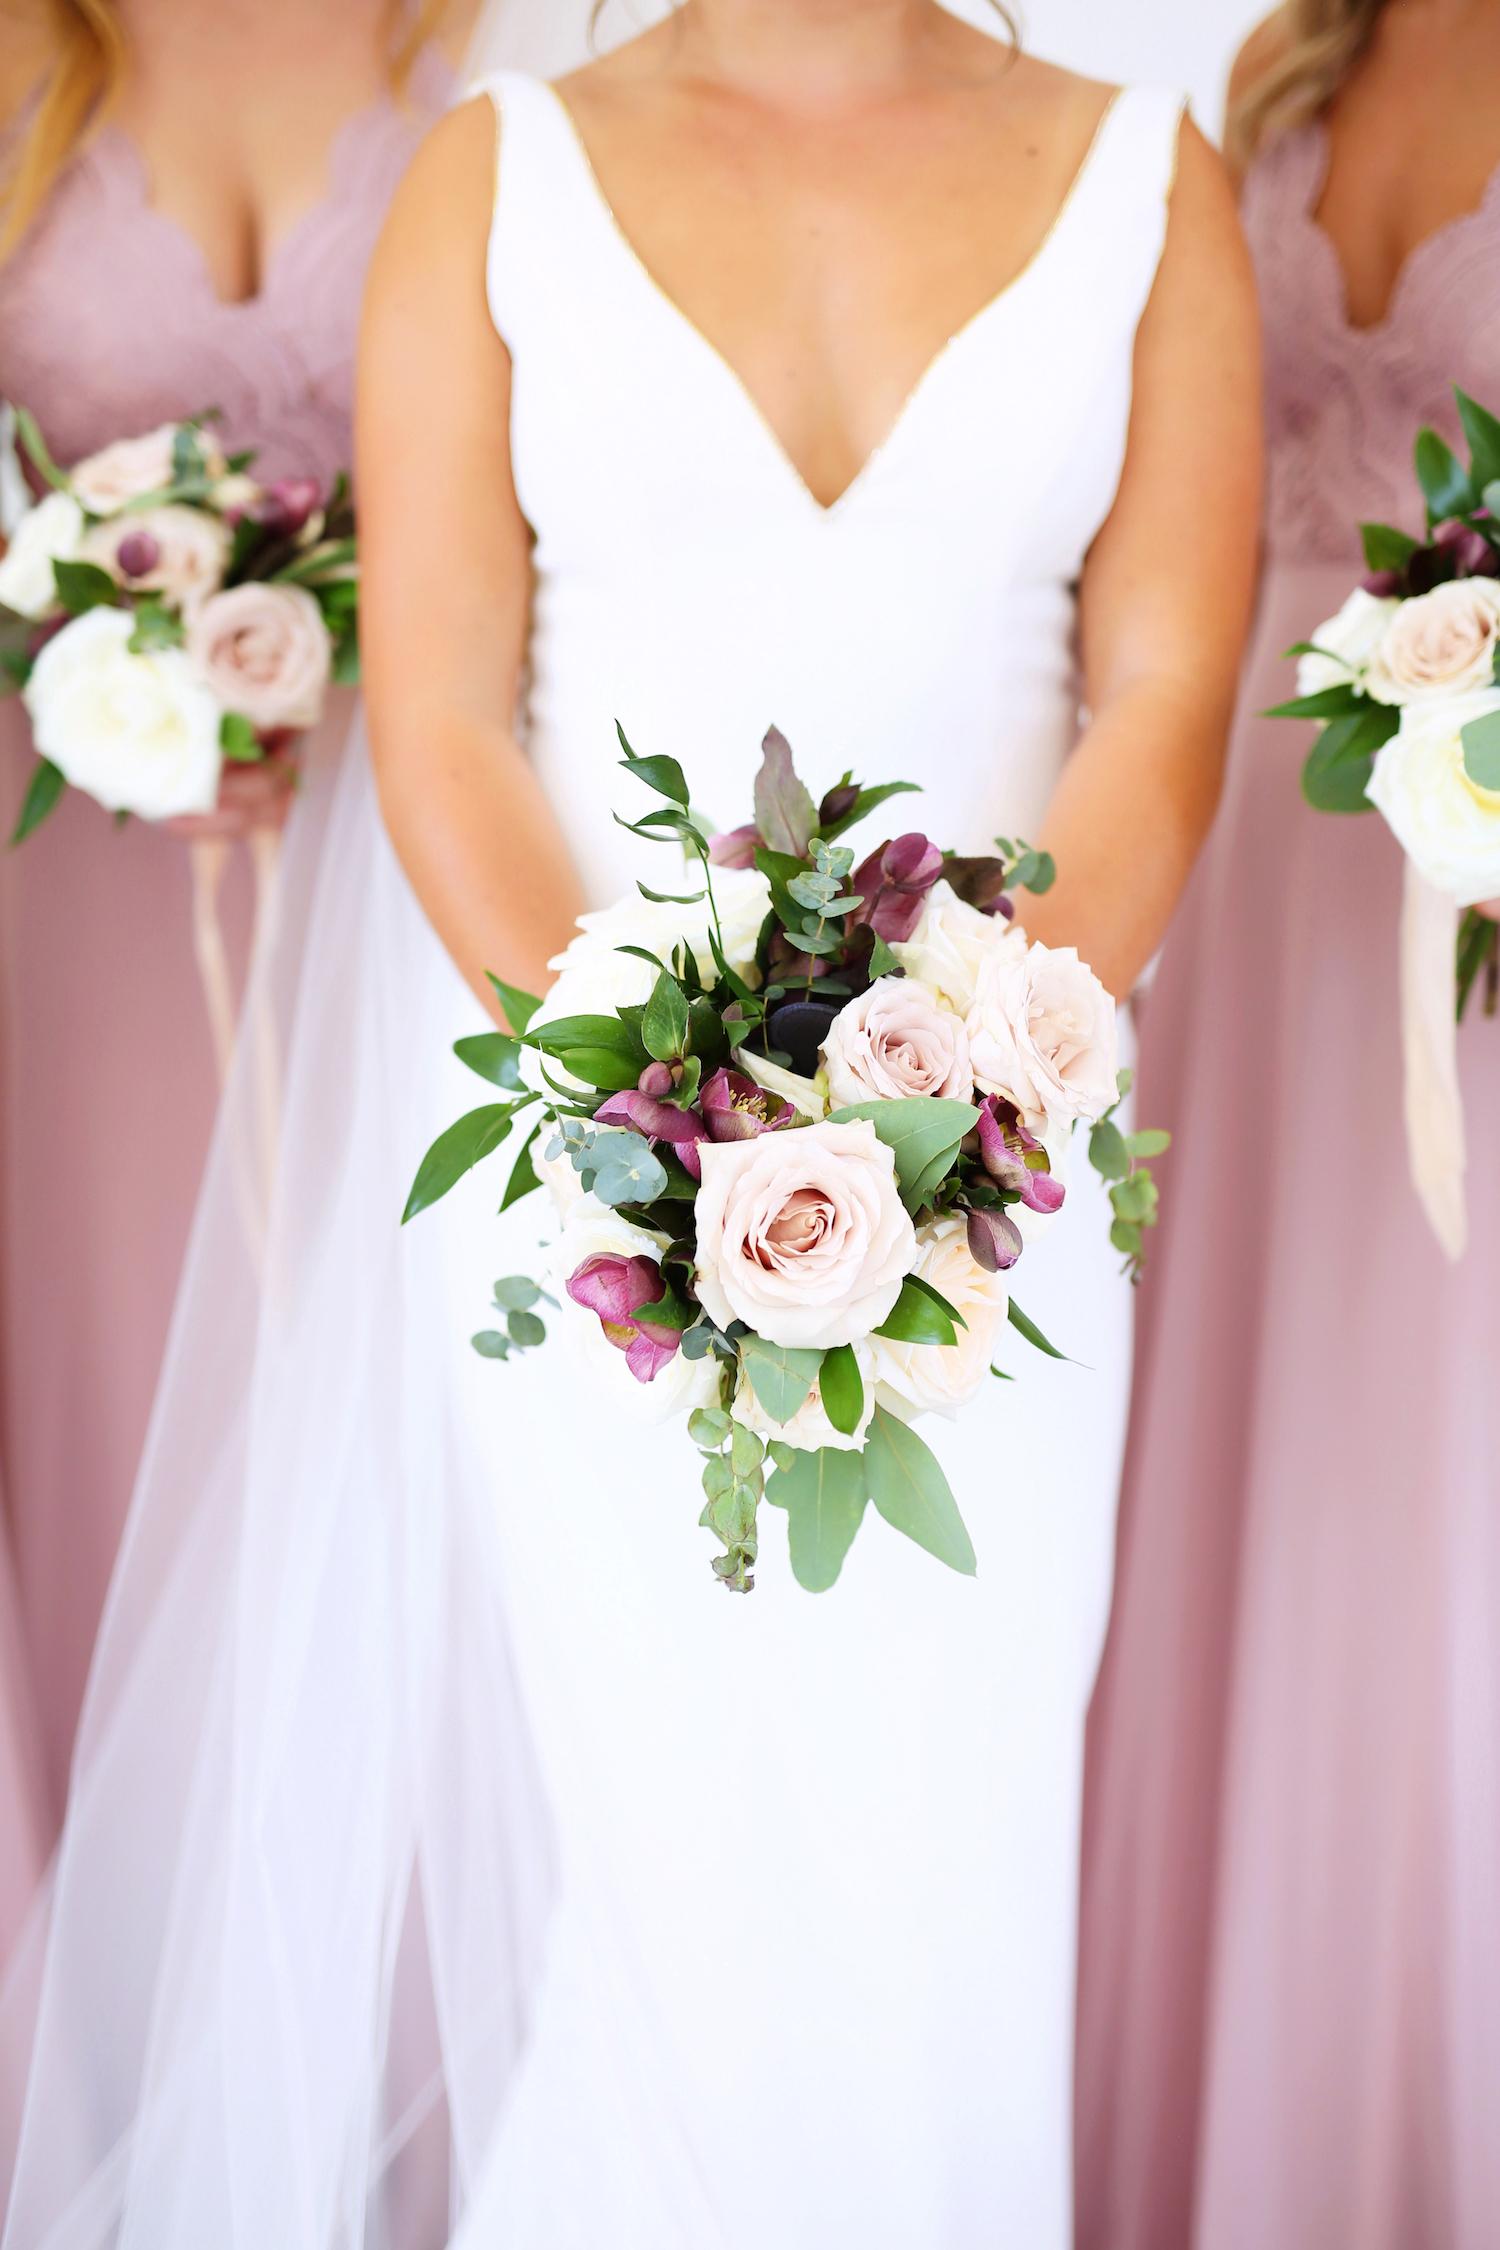 Bridal bouquet for Kalamazoo Michigan wedding